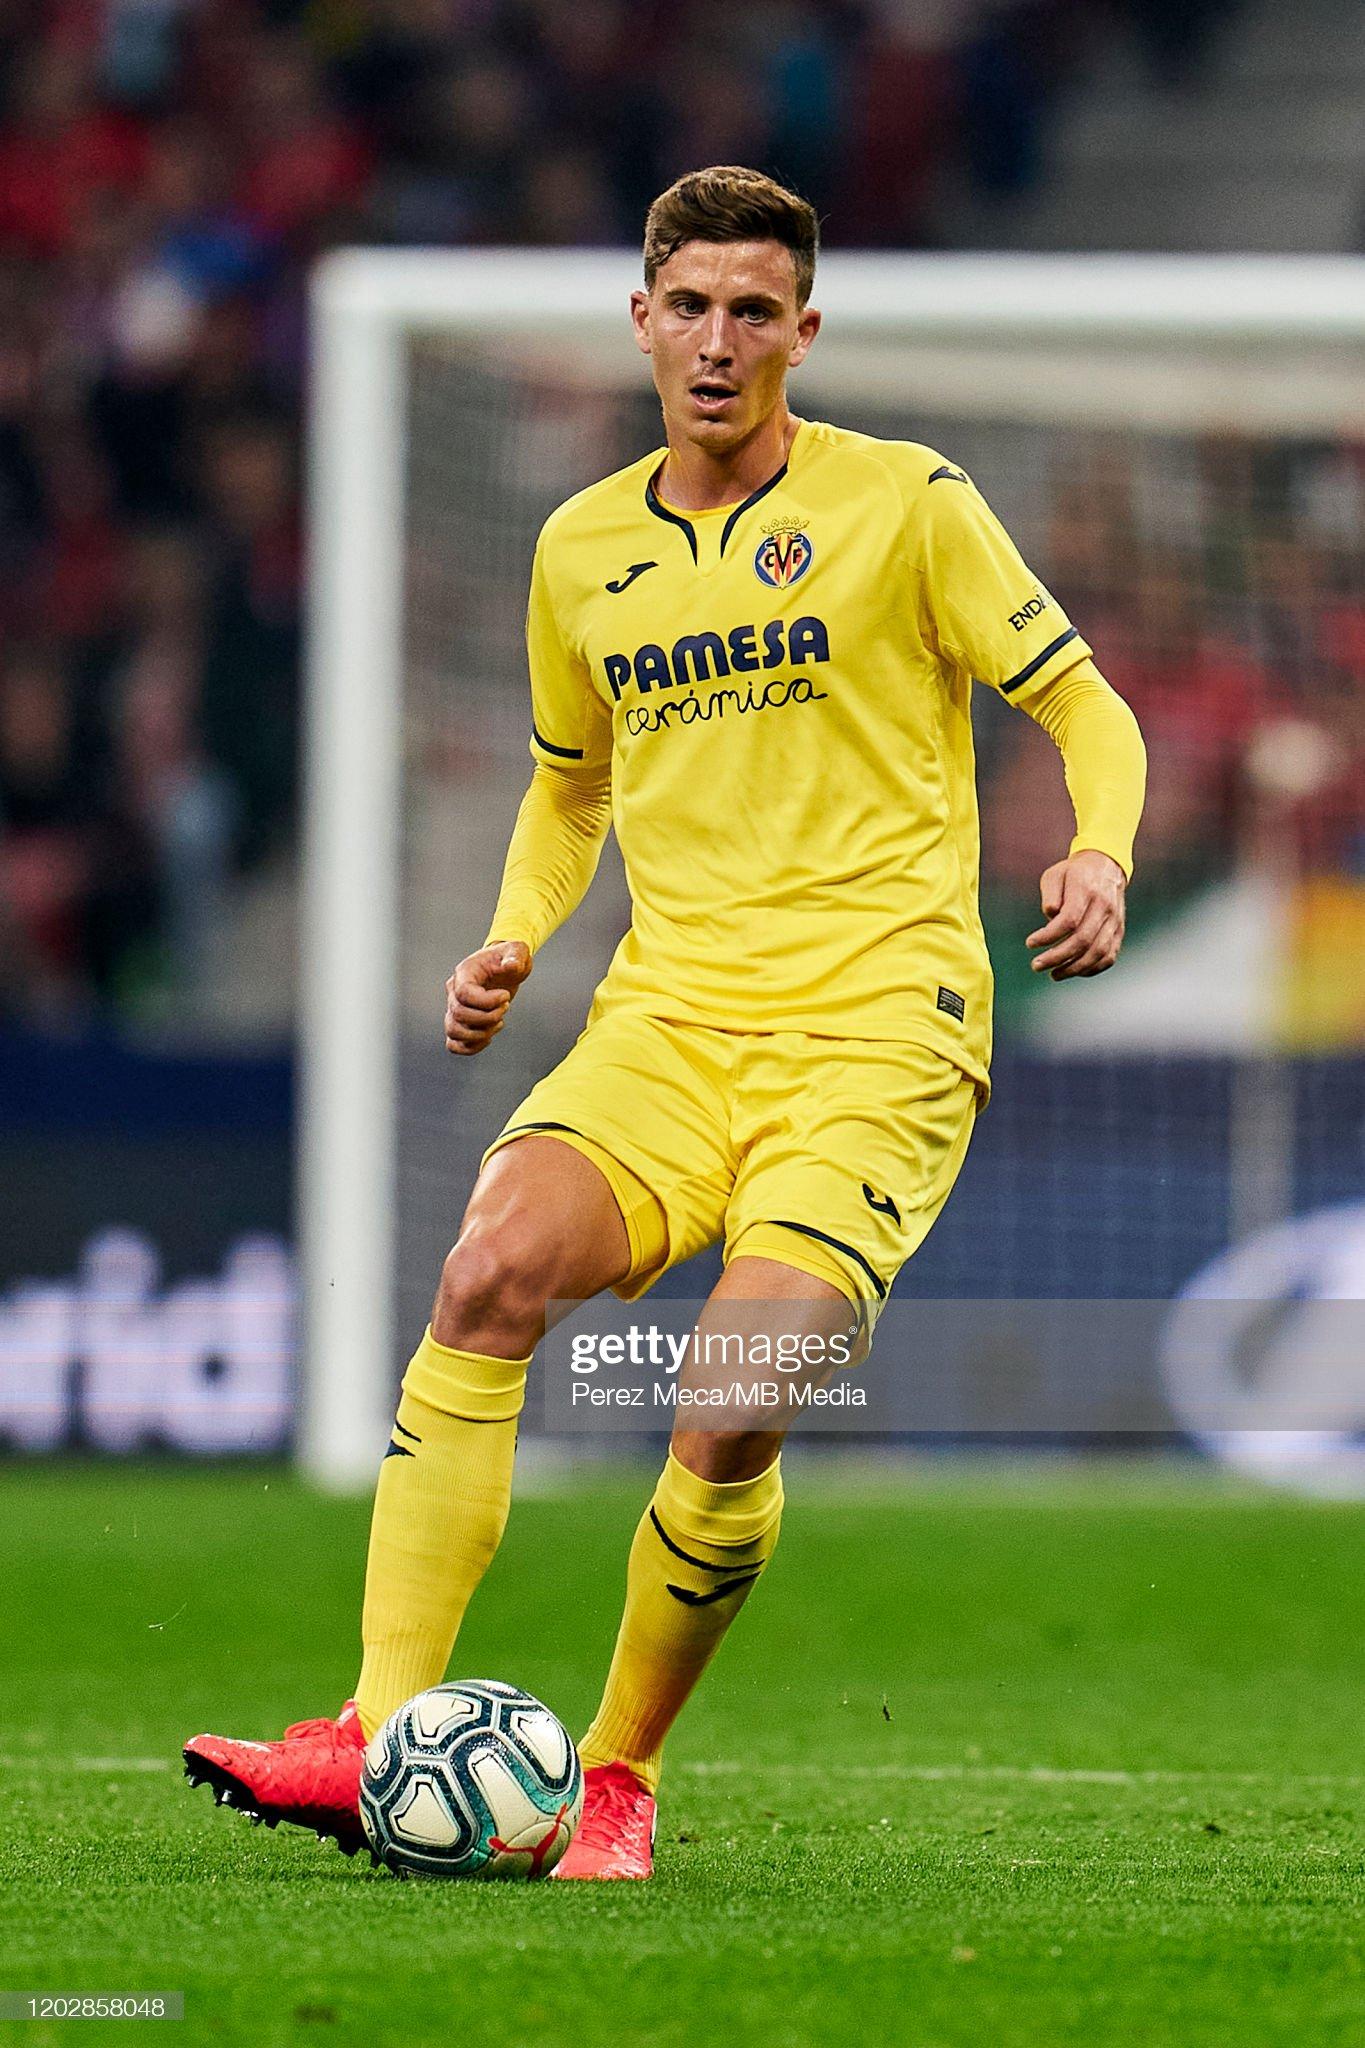 ¿Cuánto mide Pau Torres? - Altura - Real height Pau-torres-of-villarreal-cf-during-the-liga-match-between-club-de-picture-id1202858048?s=2048x2048